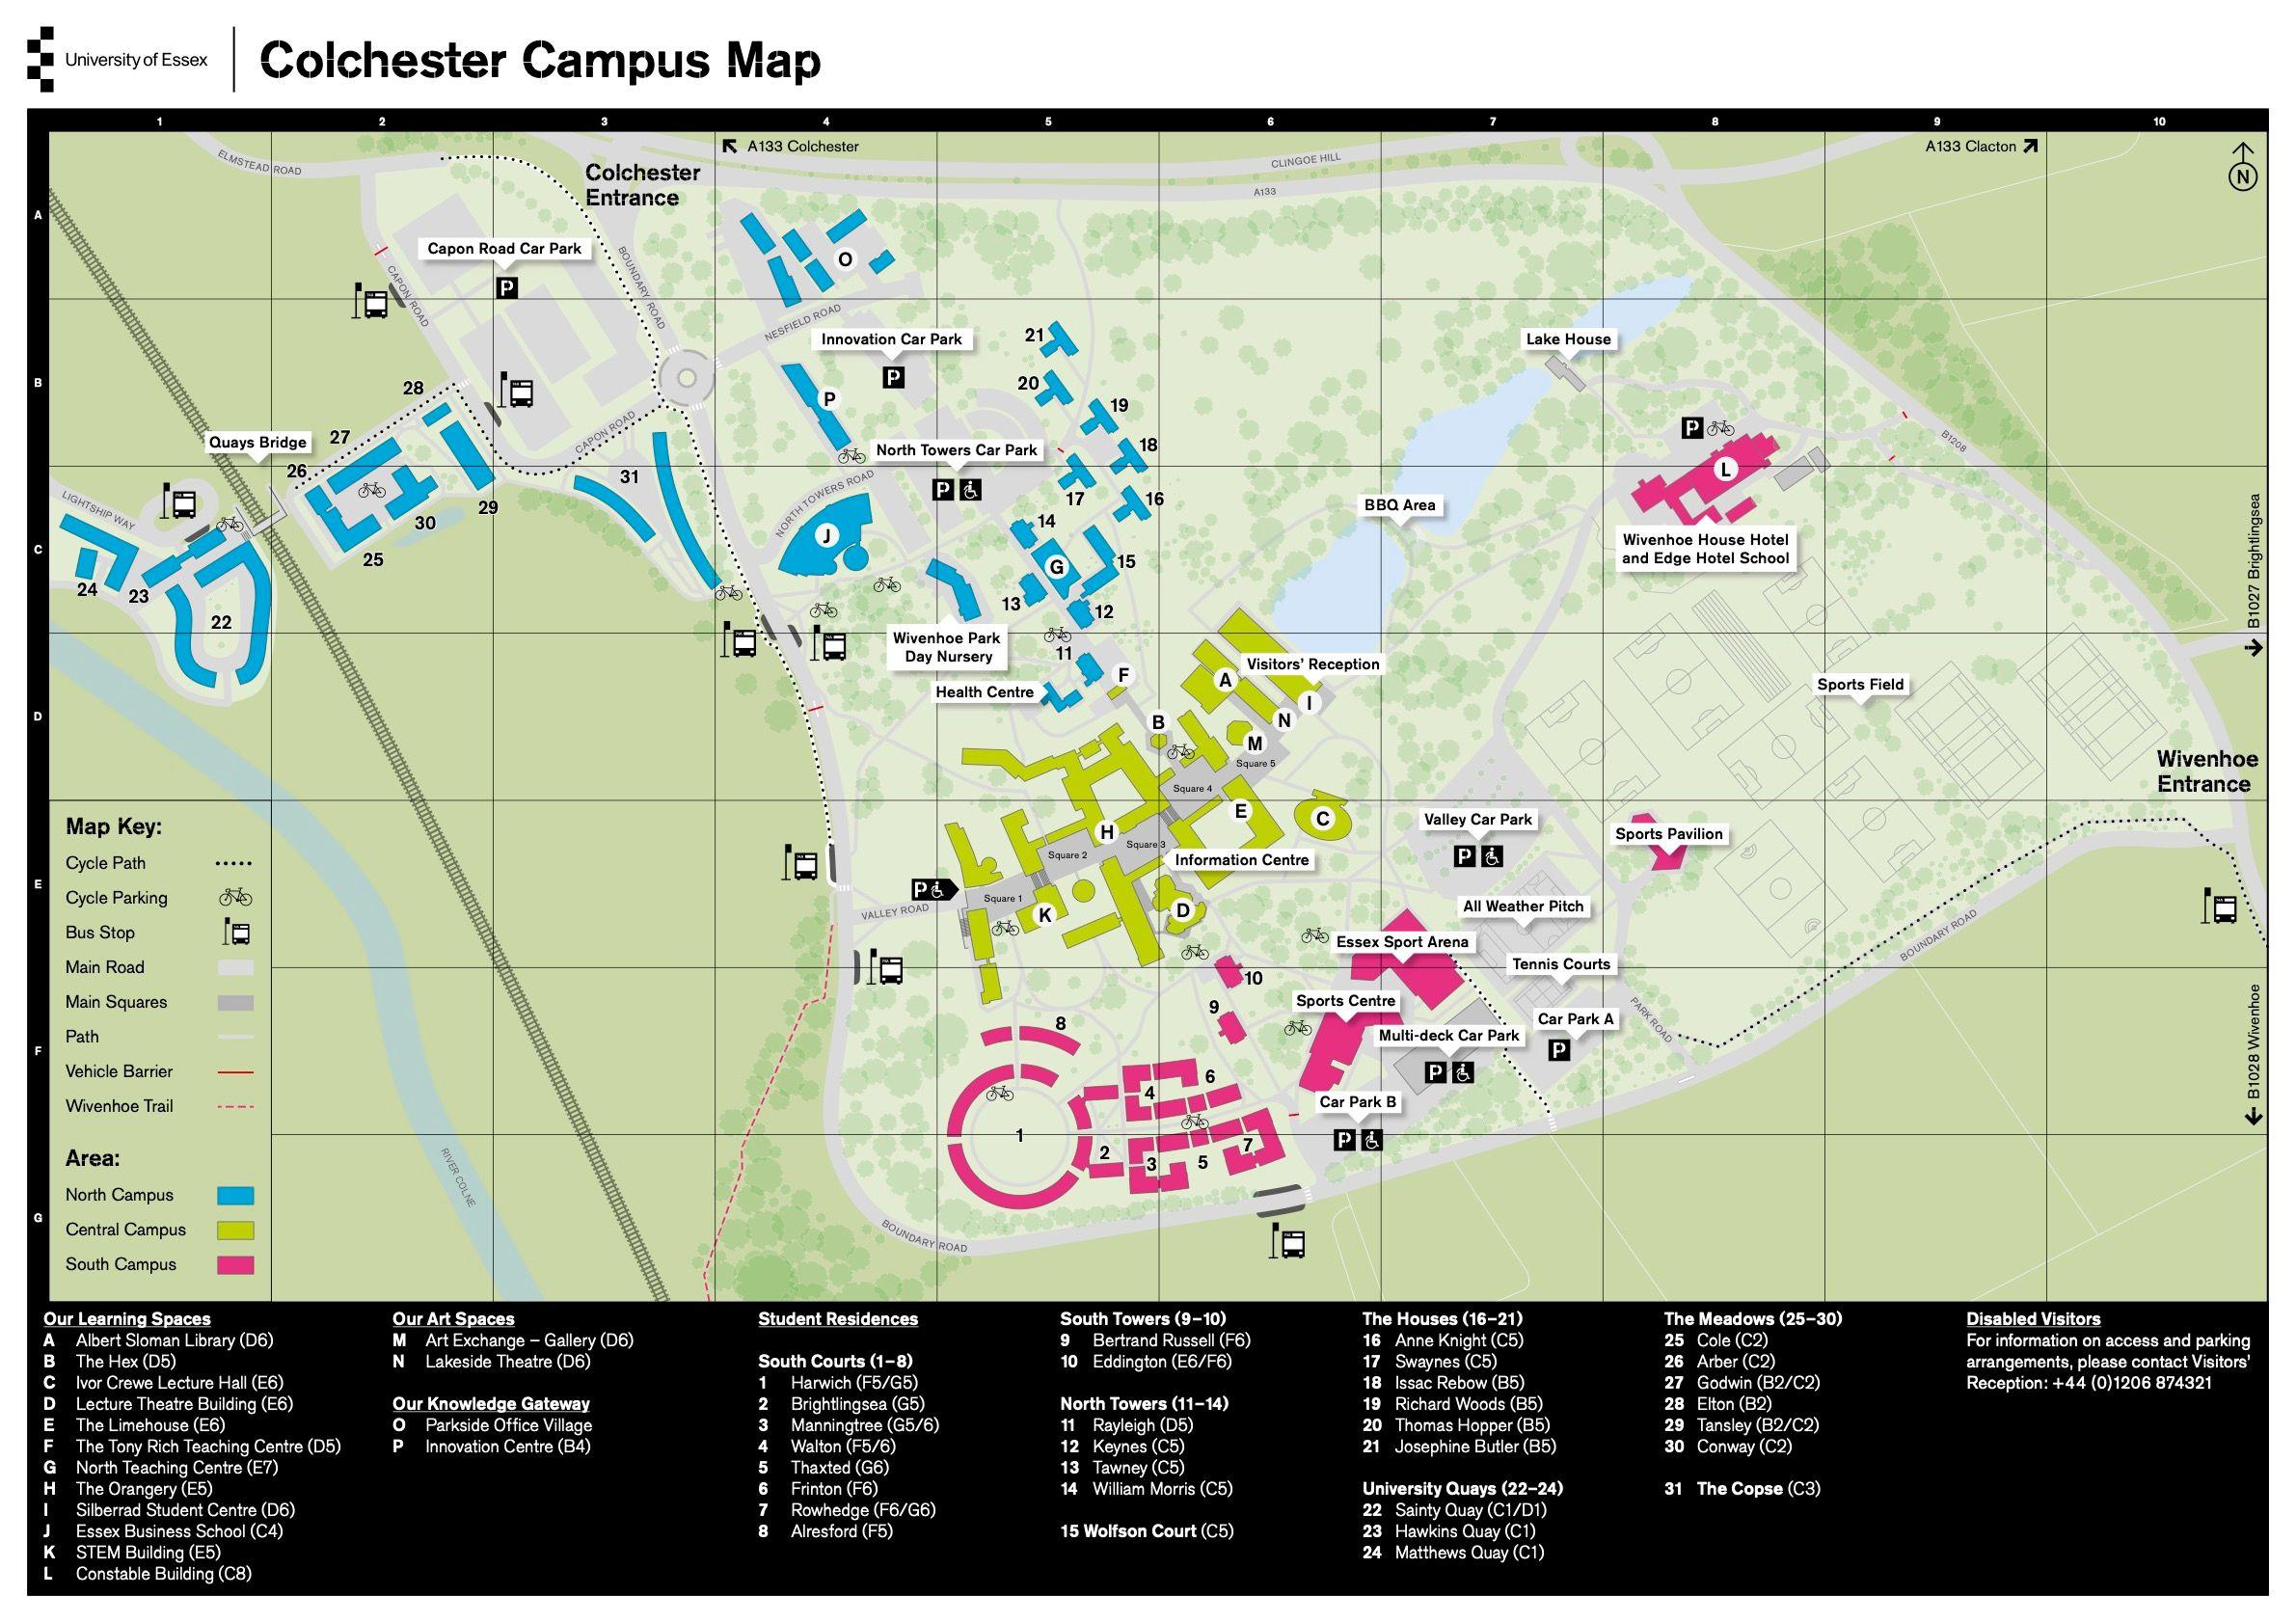 university of essex colchester